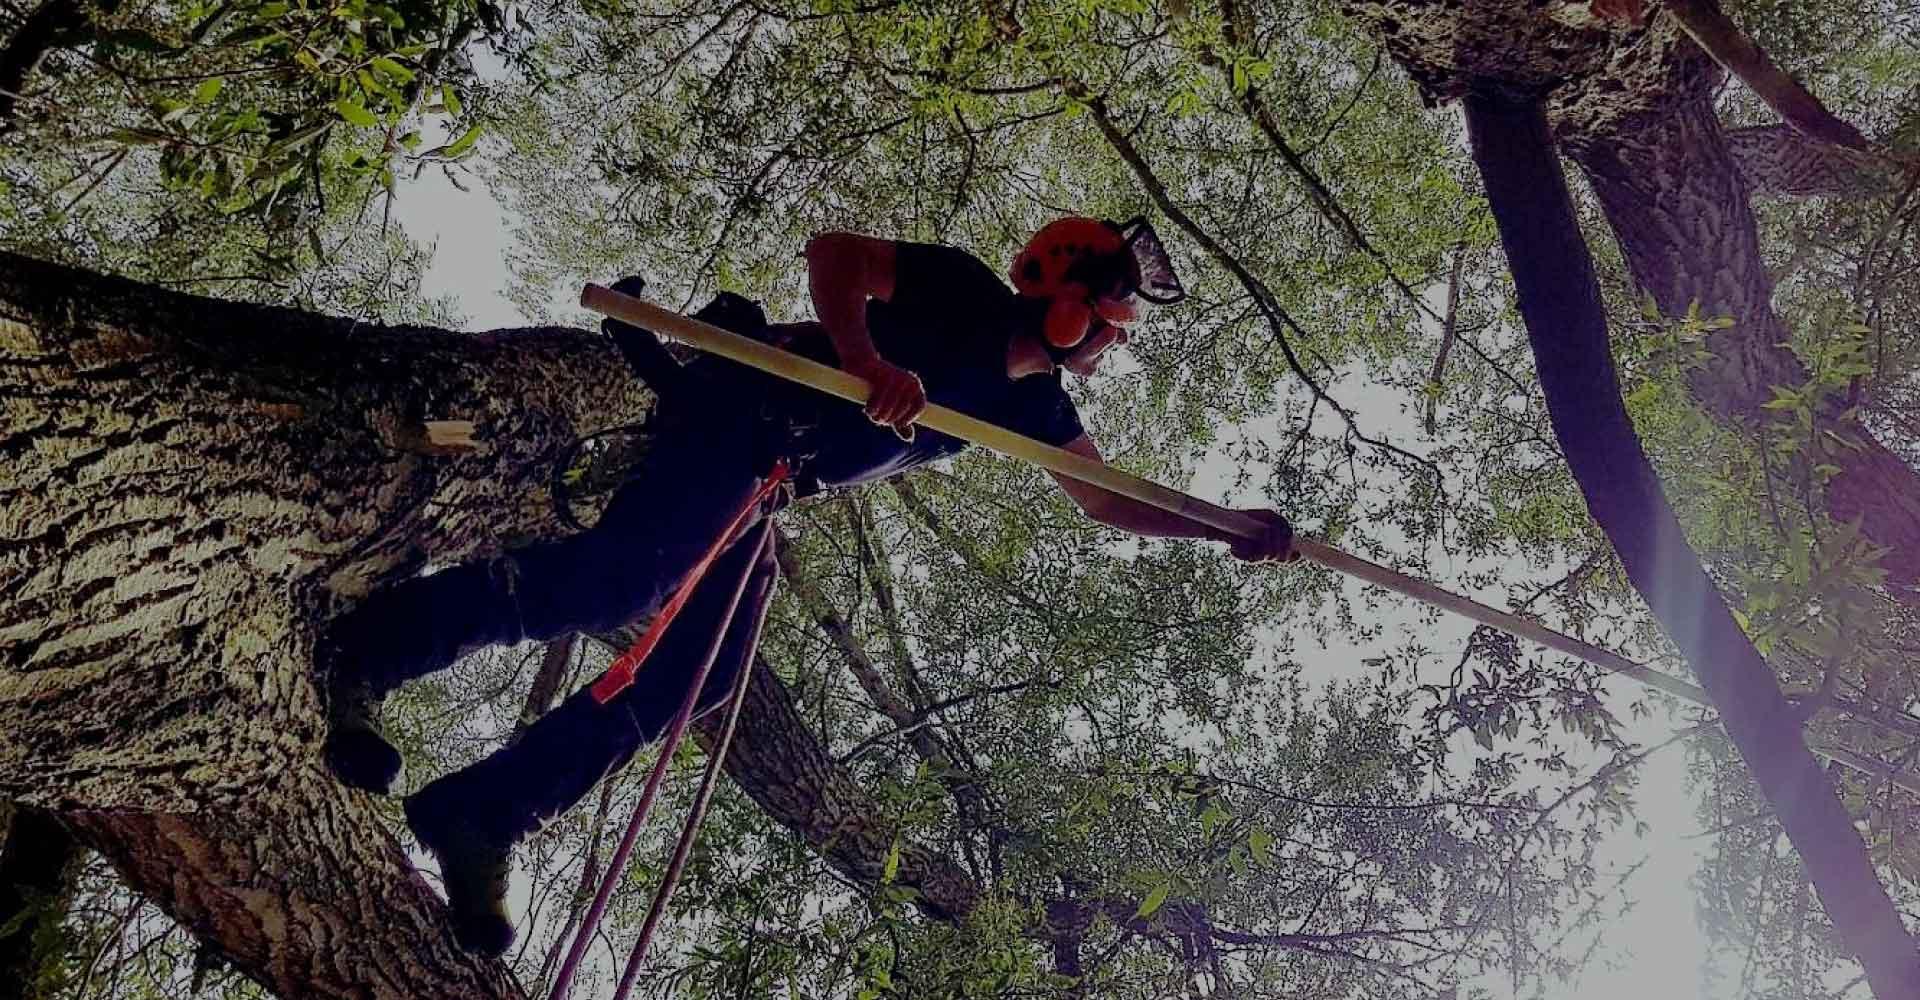 D-L-Corran-Tree-Surgeons-Abergavenny-Slider-2